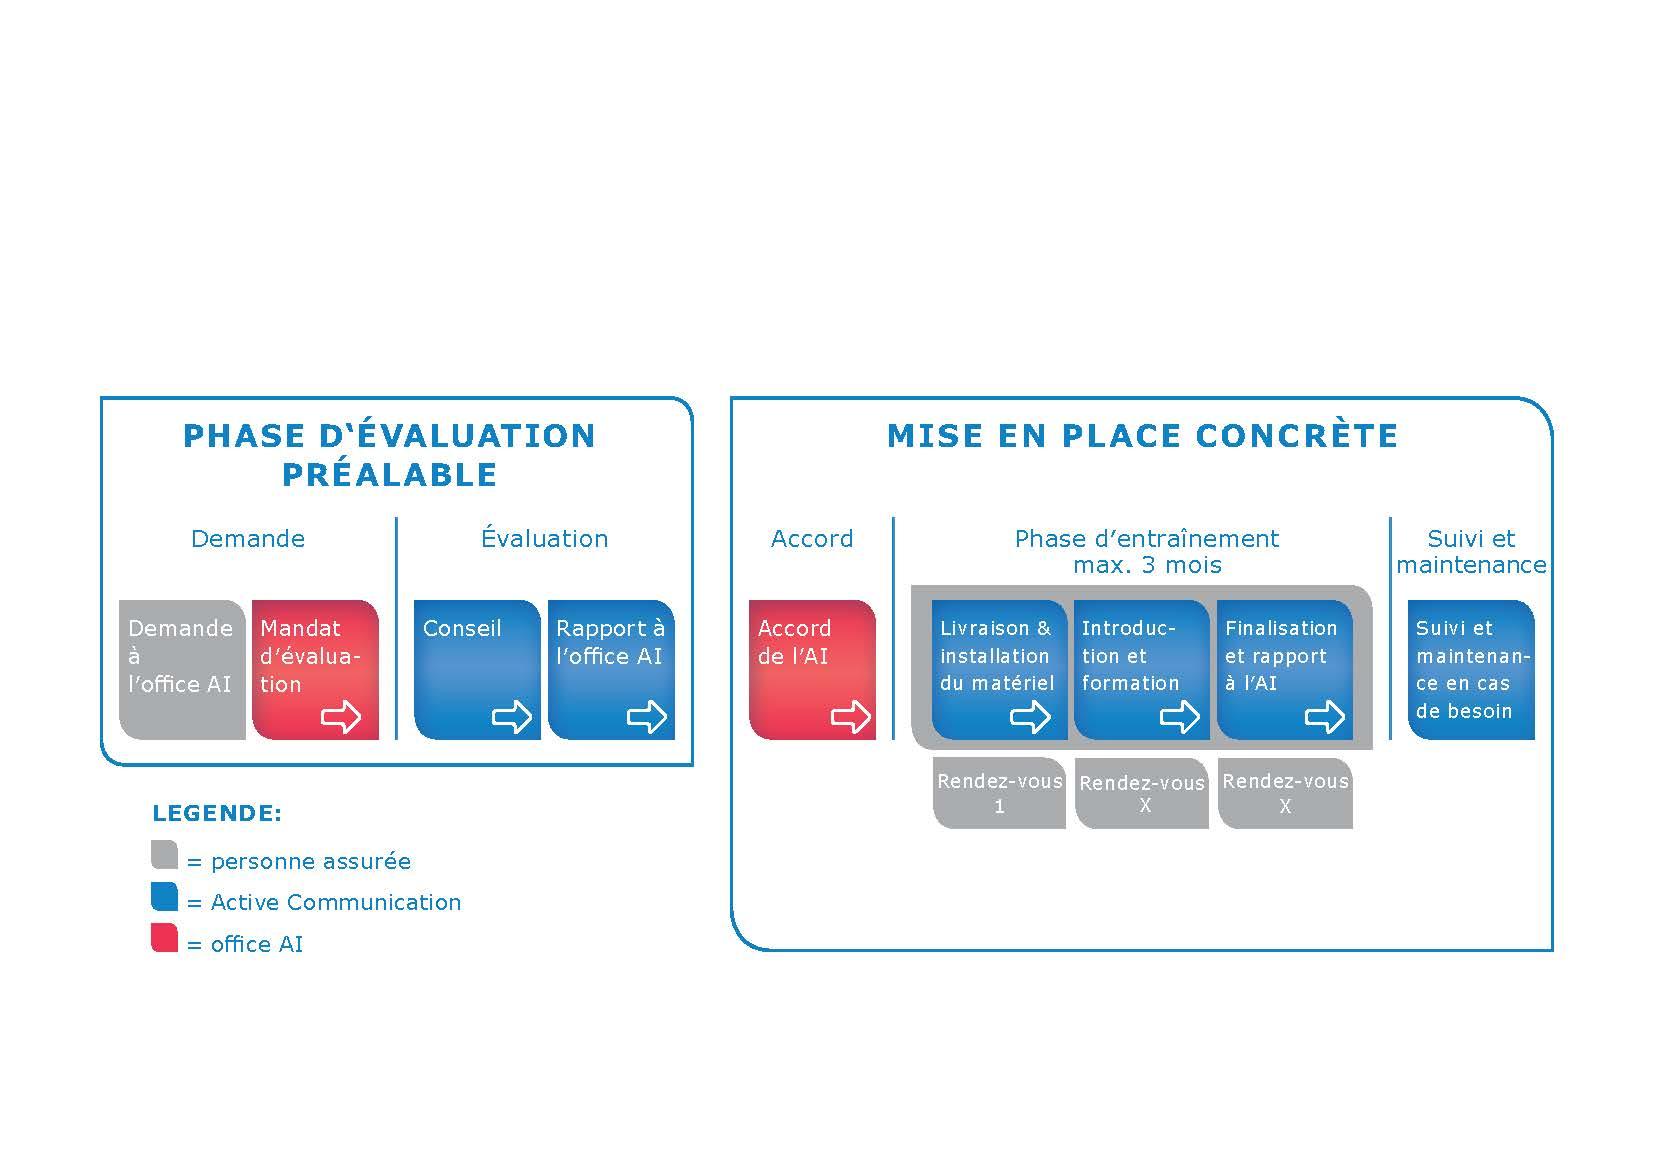 202007_ac-grafik-hilfsmittelversorgung-fr